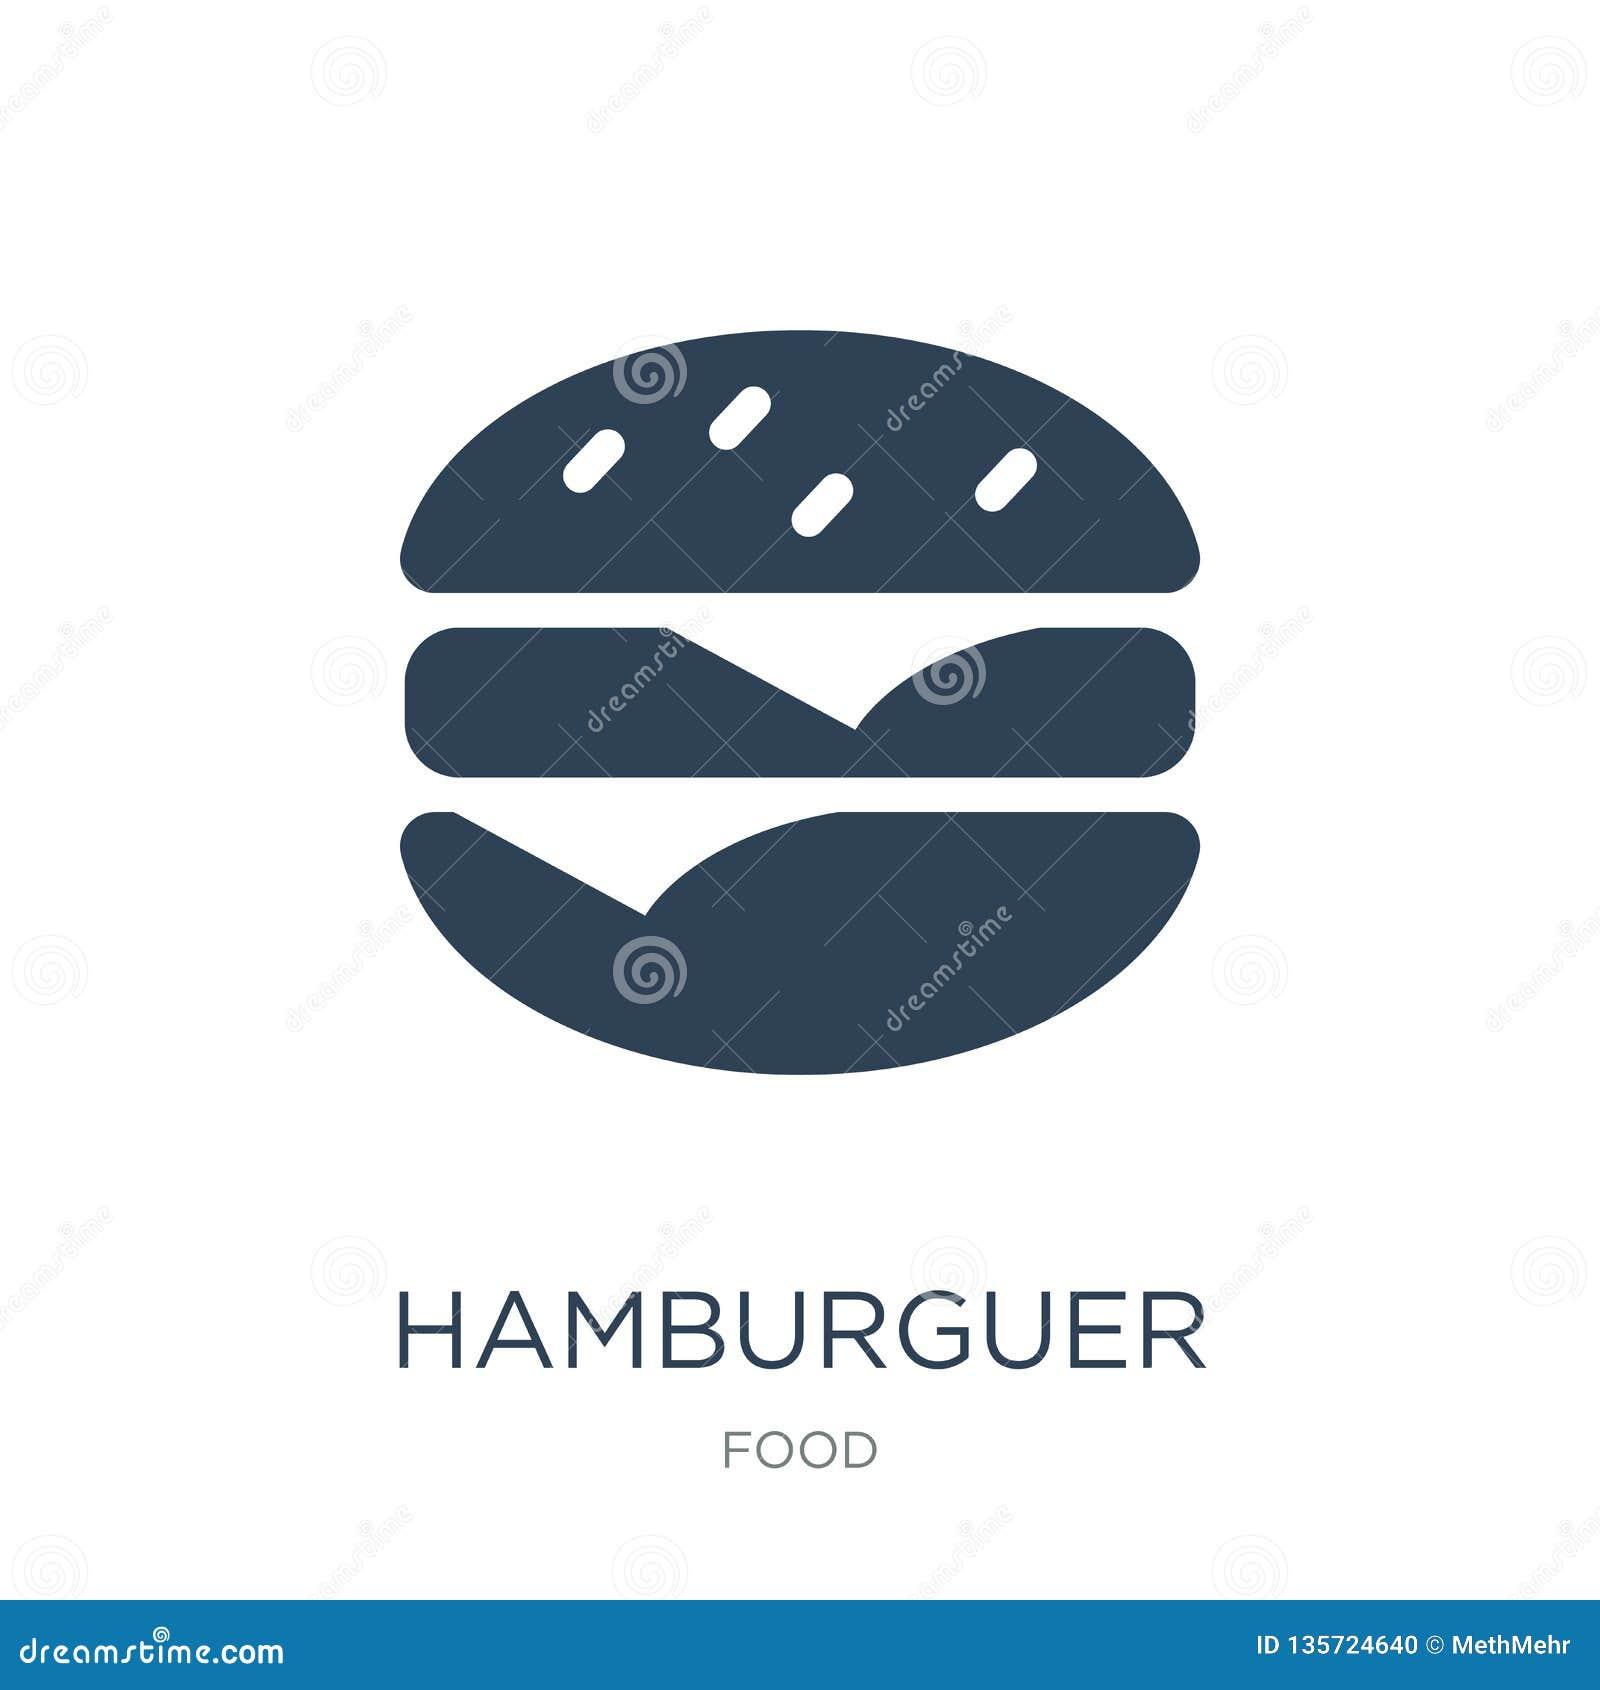 Icono del hamburguer en estilo de moda del diseño icono del hamburguer aislado en el fondo blanco icono del vector del hamburguer